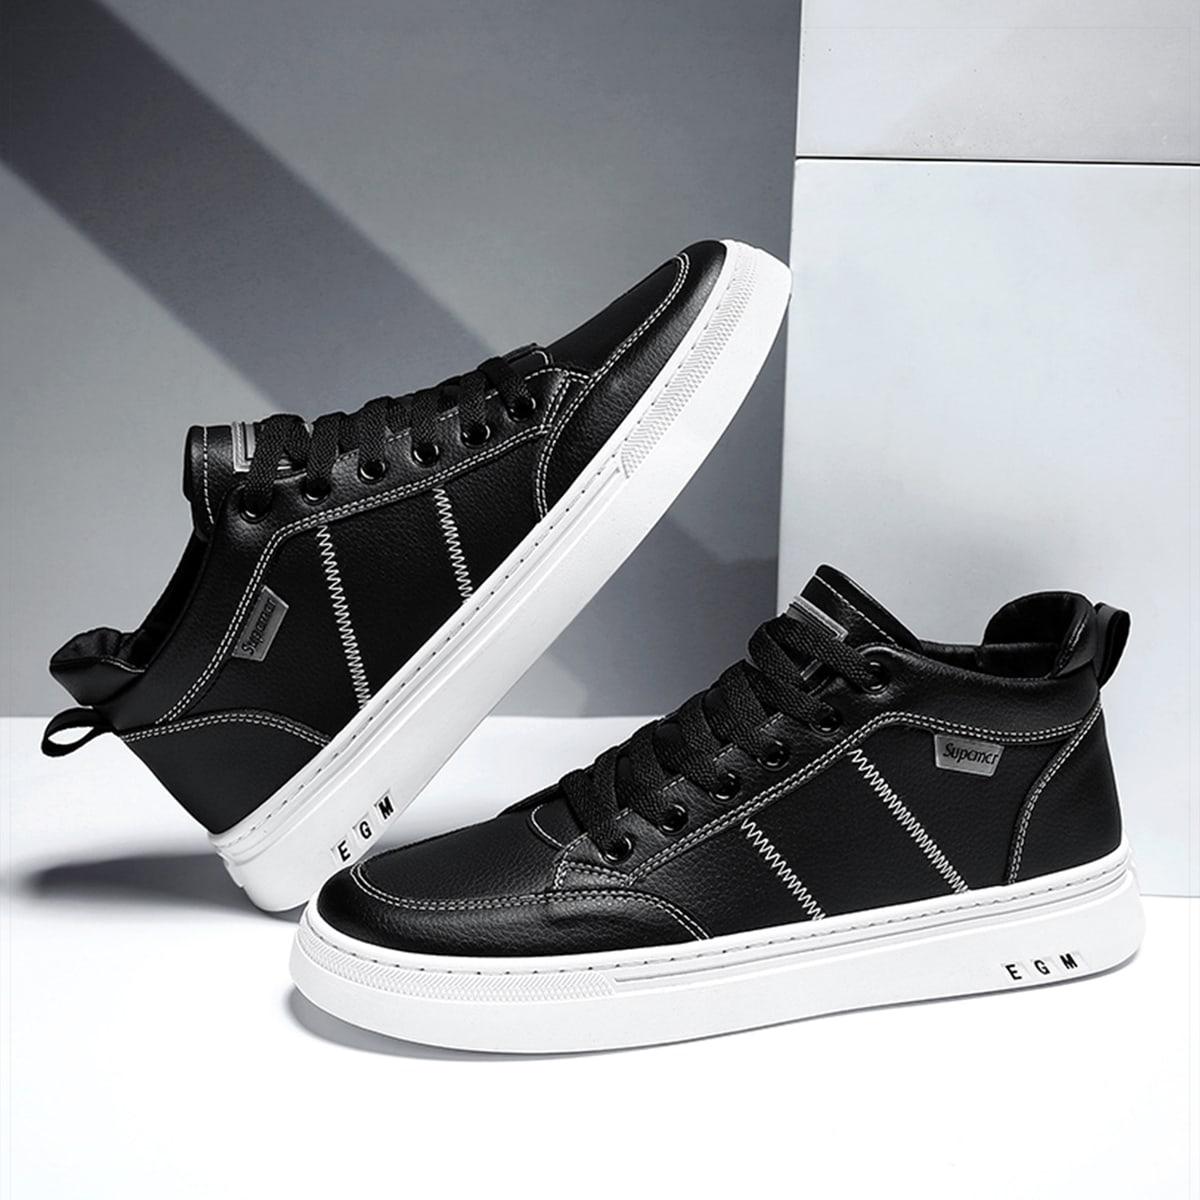 Men Stitch Detail High Top Skate Shoes